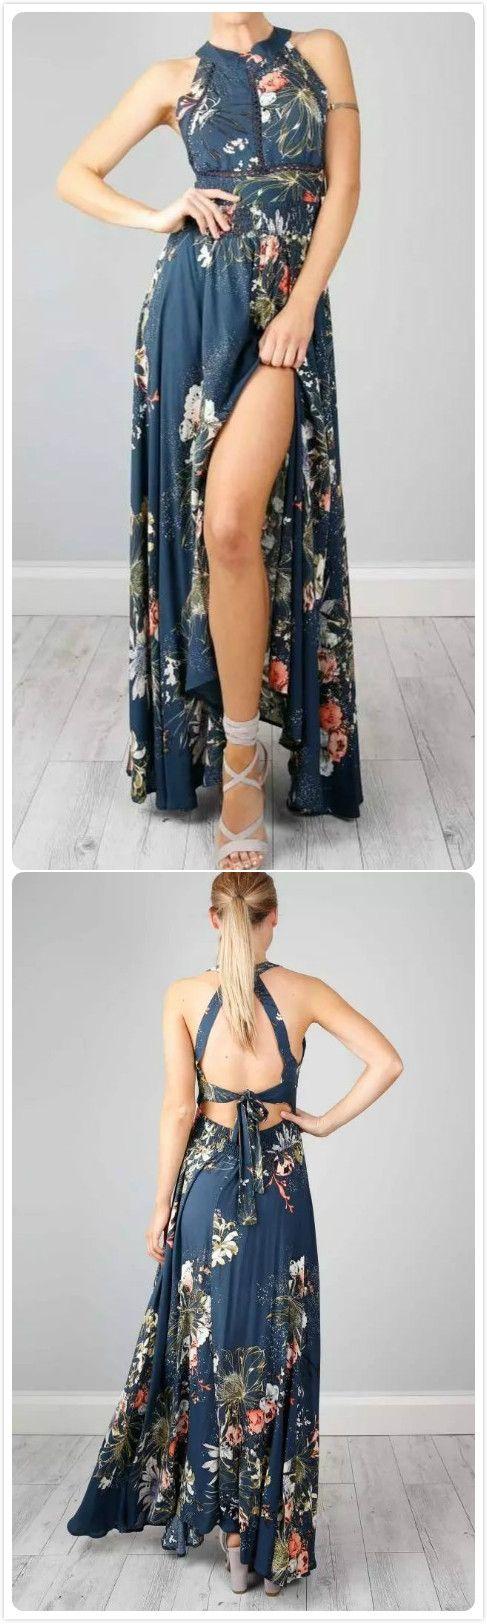 Halter Backless Floral Printed Maxi Dress